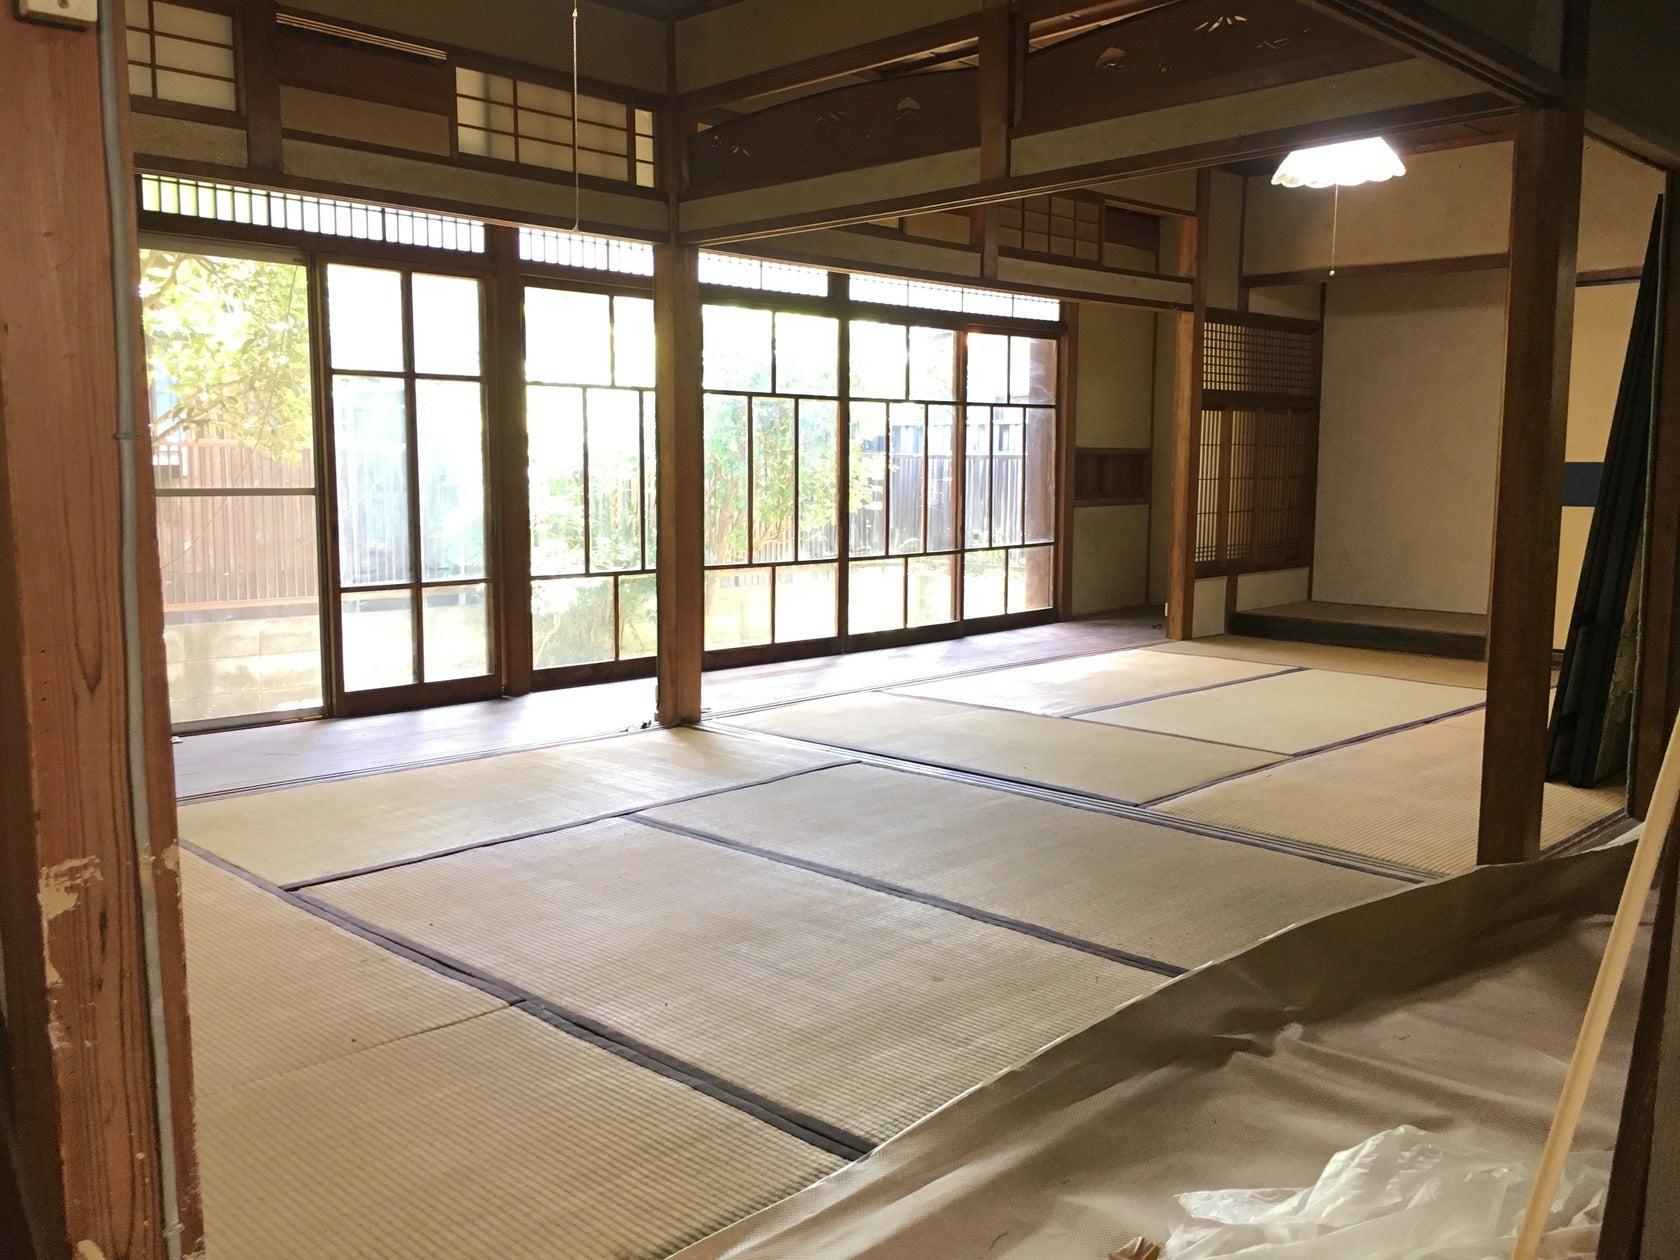 NEW!! 大阪市内から近い古民家撮影スペース!豊中(古民家 間借り(マガリ) 豊中) の写真0